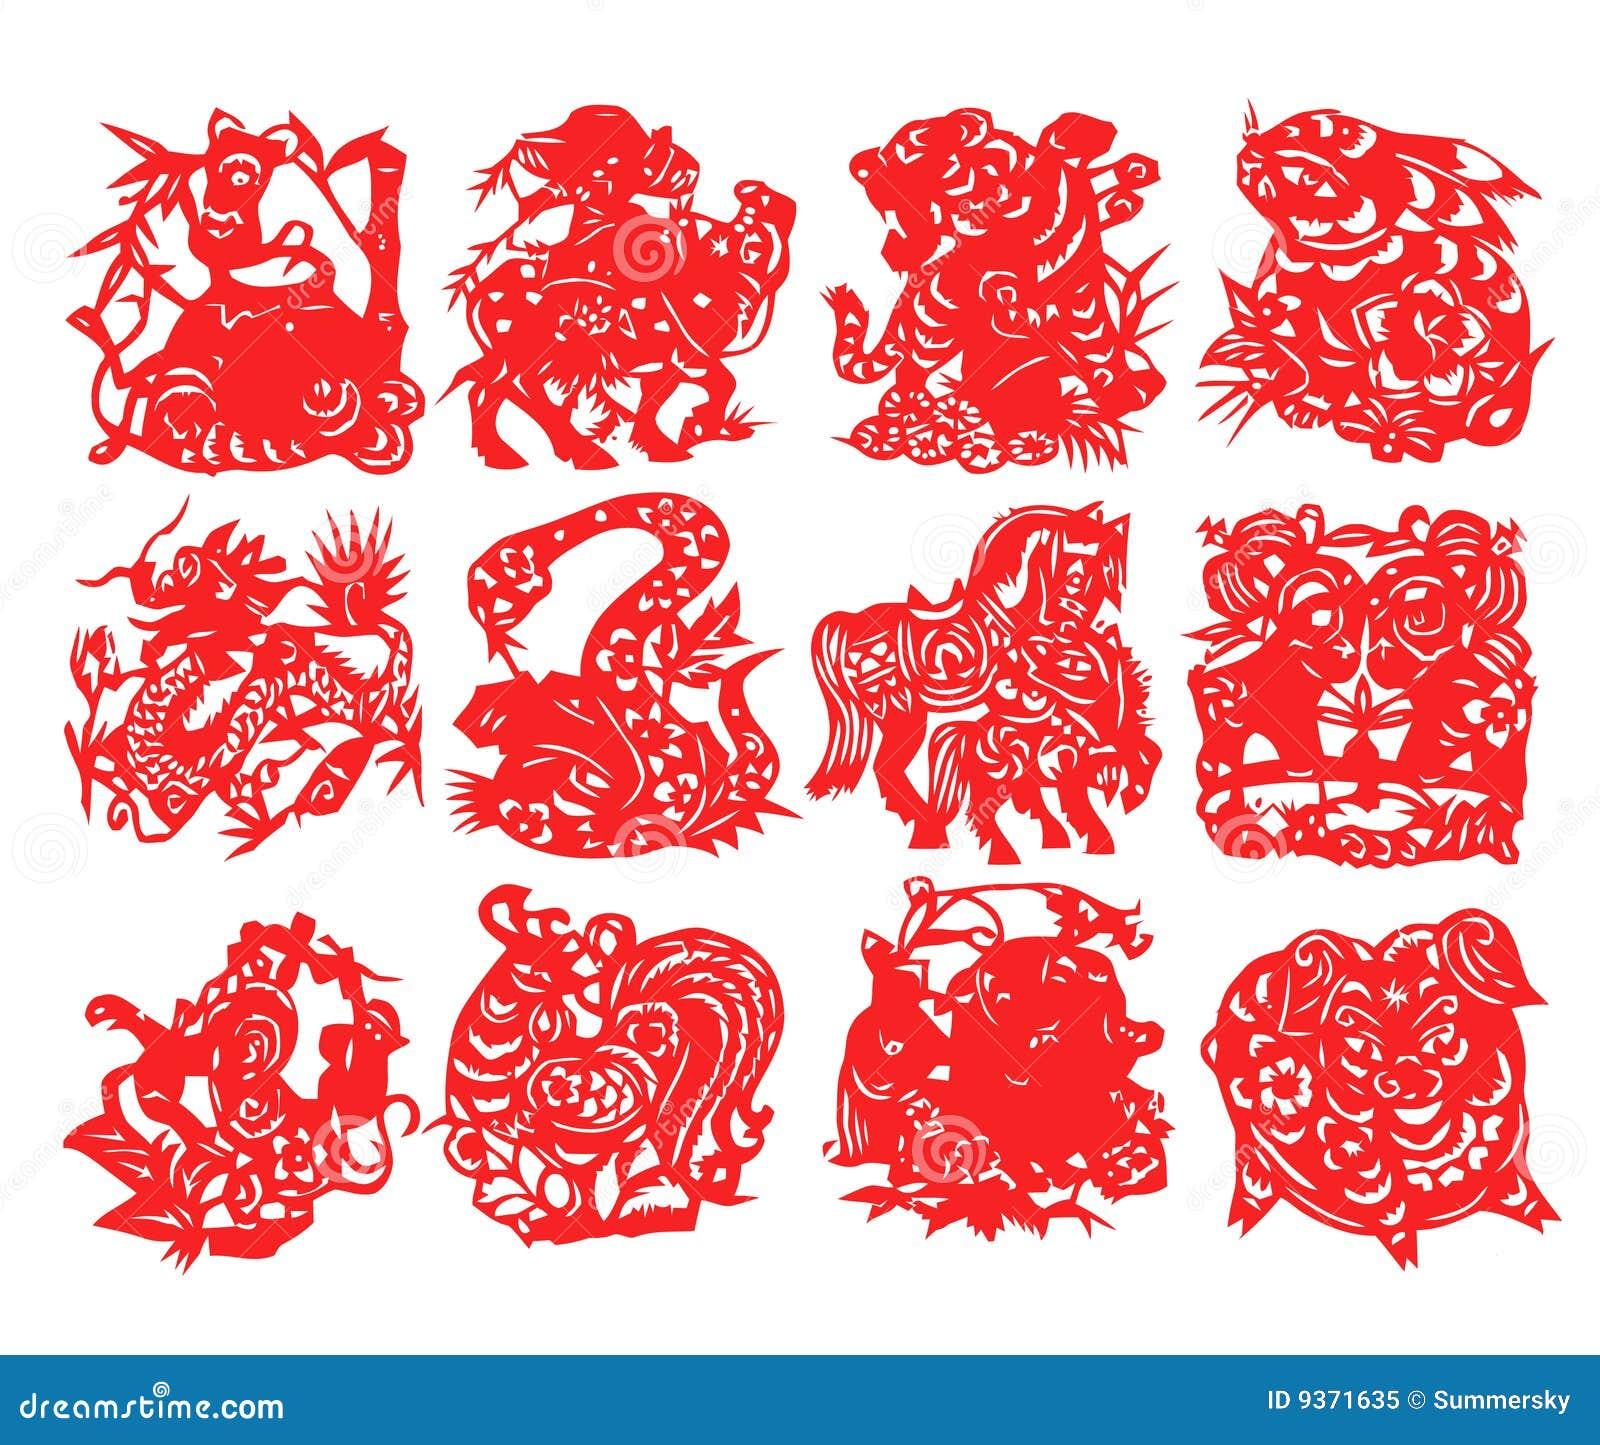 Chinese Zodiac Royalty Free Stock Photo - Image: 9371635